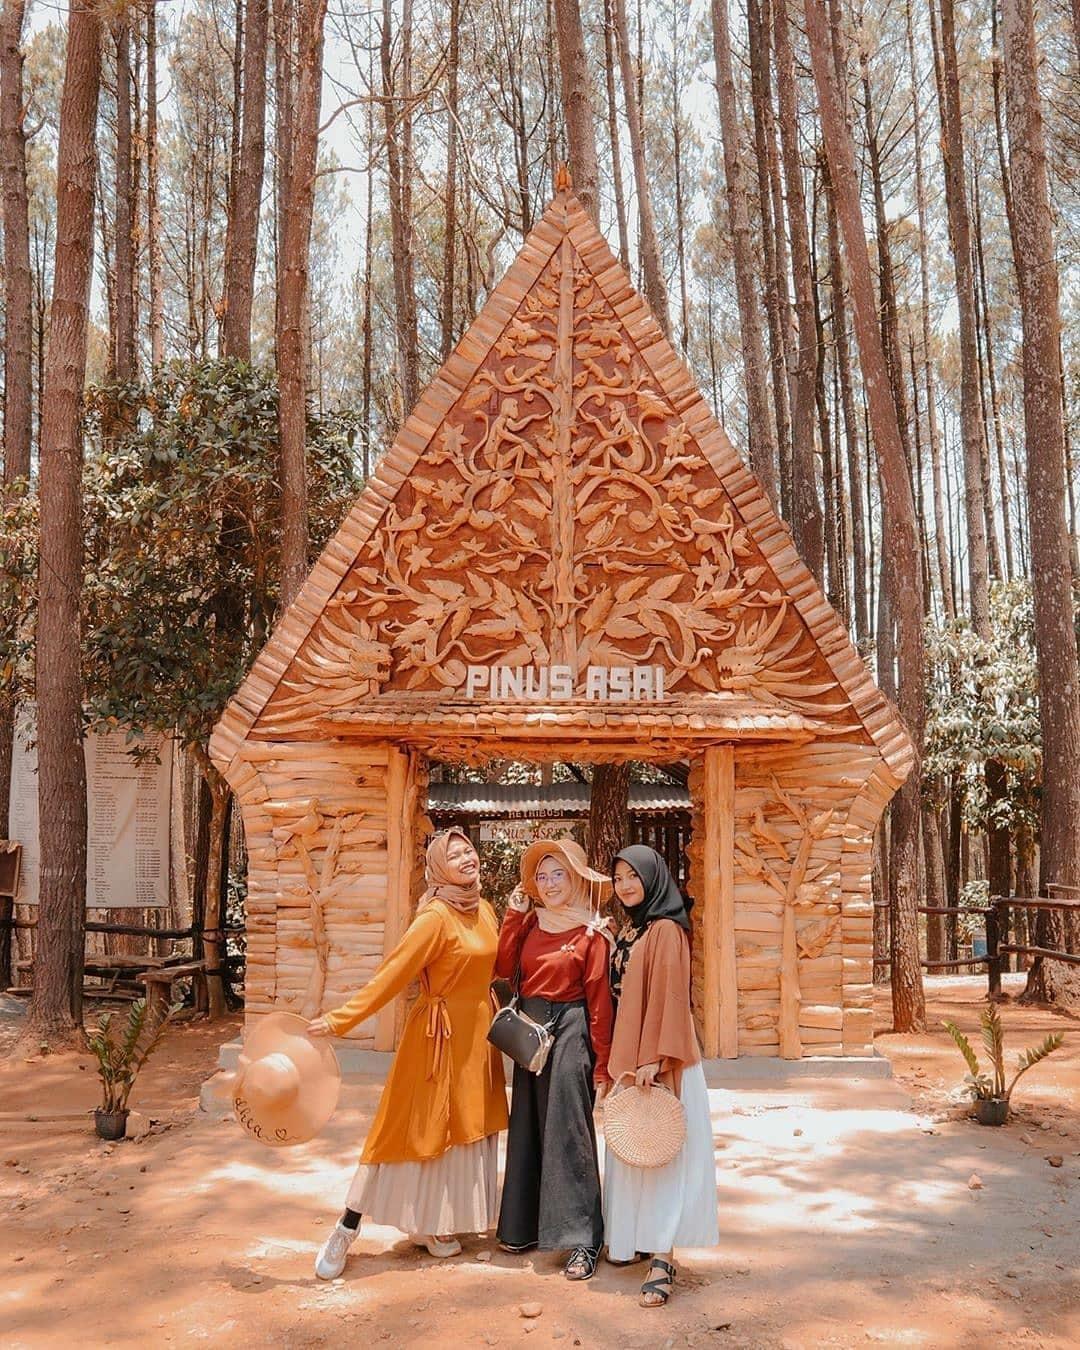 Harga Tiket Masuk Hutan Pinus Asri